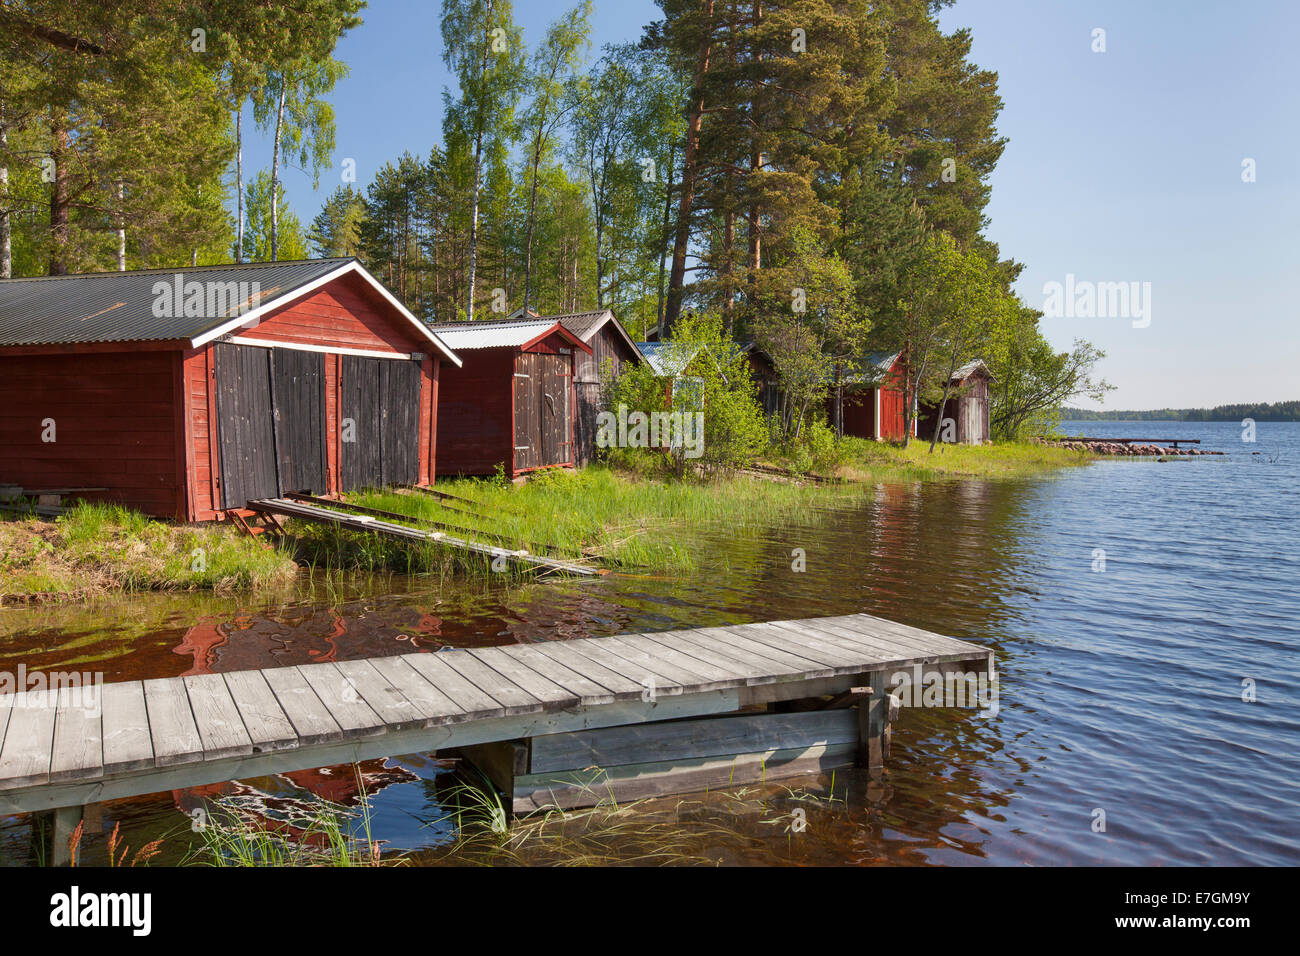 Red wooden boathouses along lake Siljan in summer, Dalarna, Sweden - Stock Image